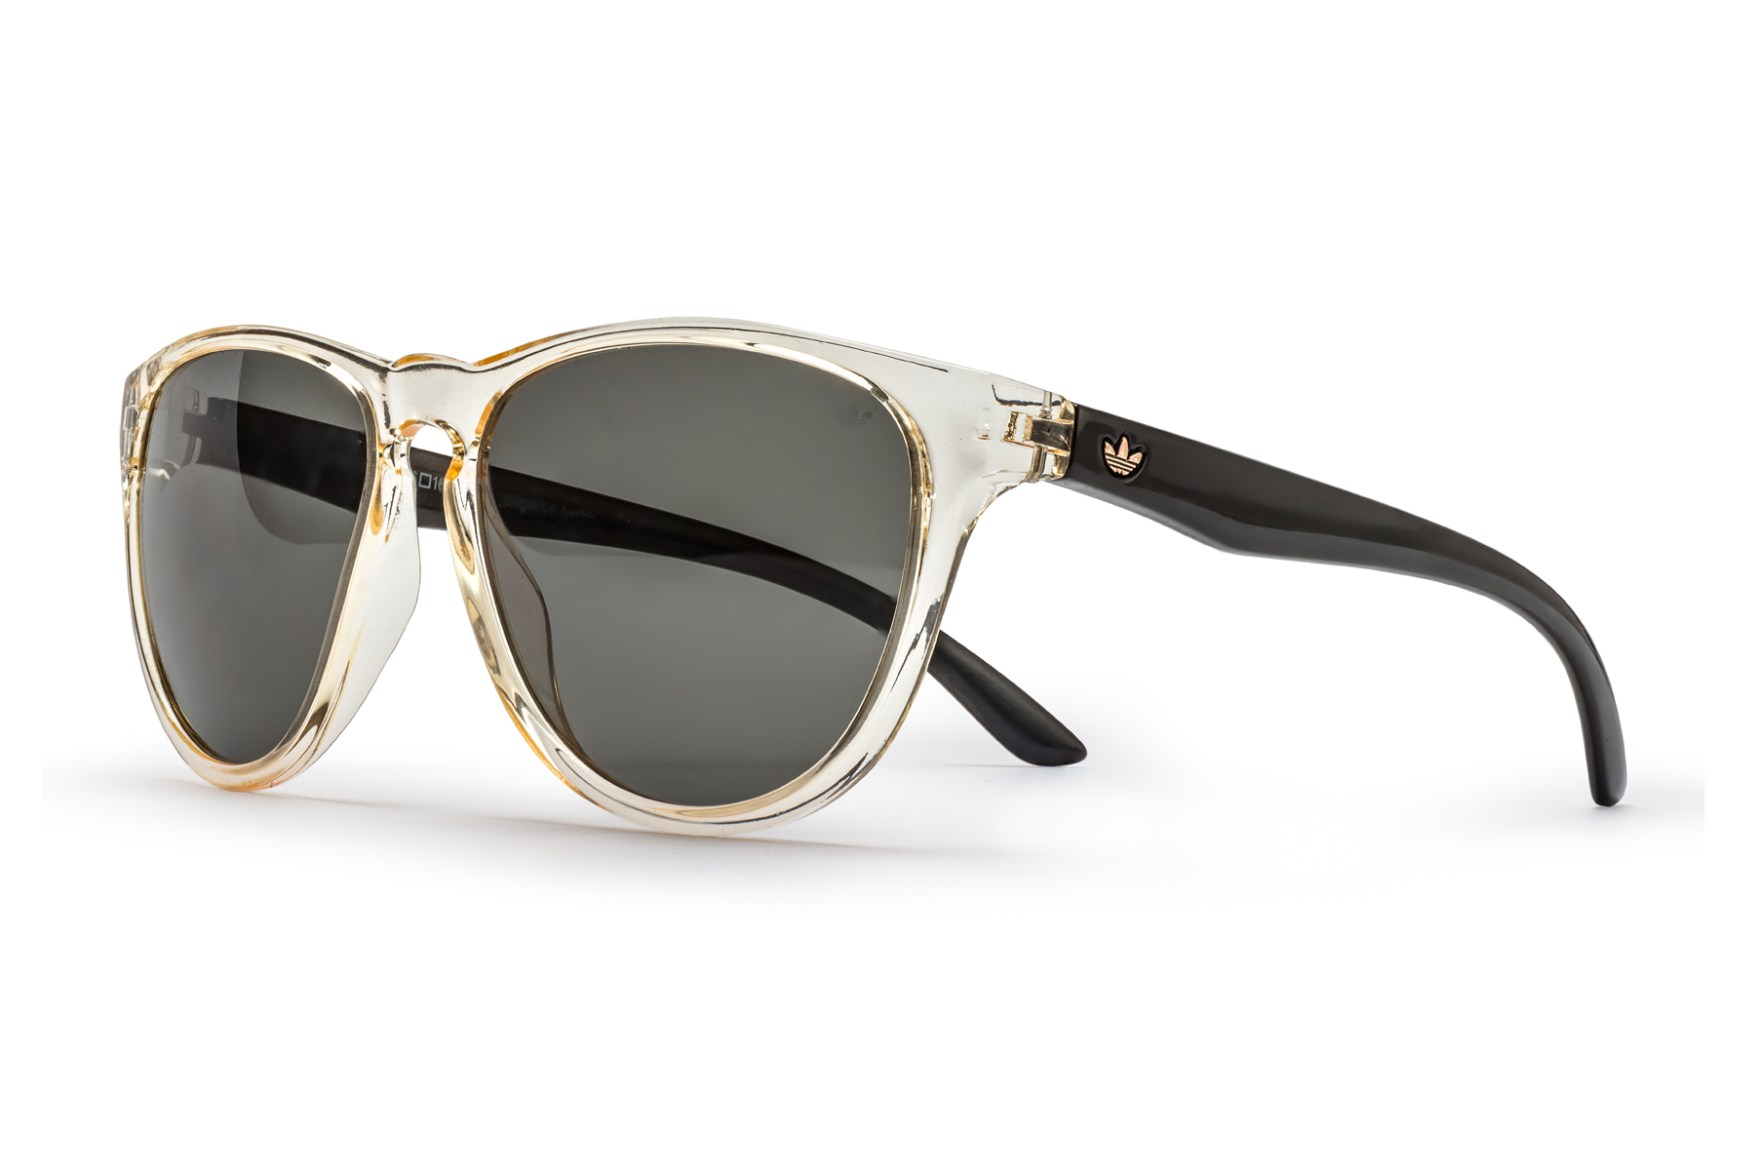 adidas Originals 2014 Spring/Summer Eyewear Collection